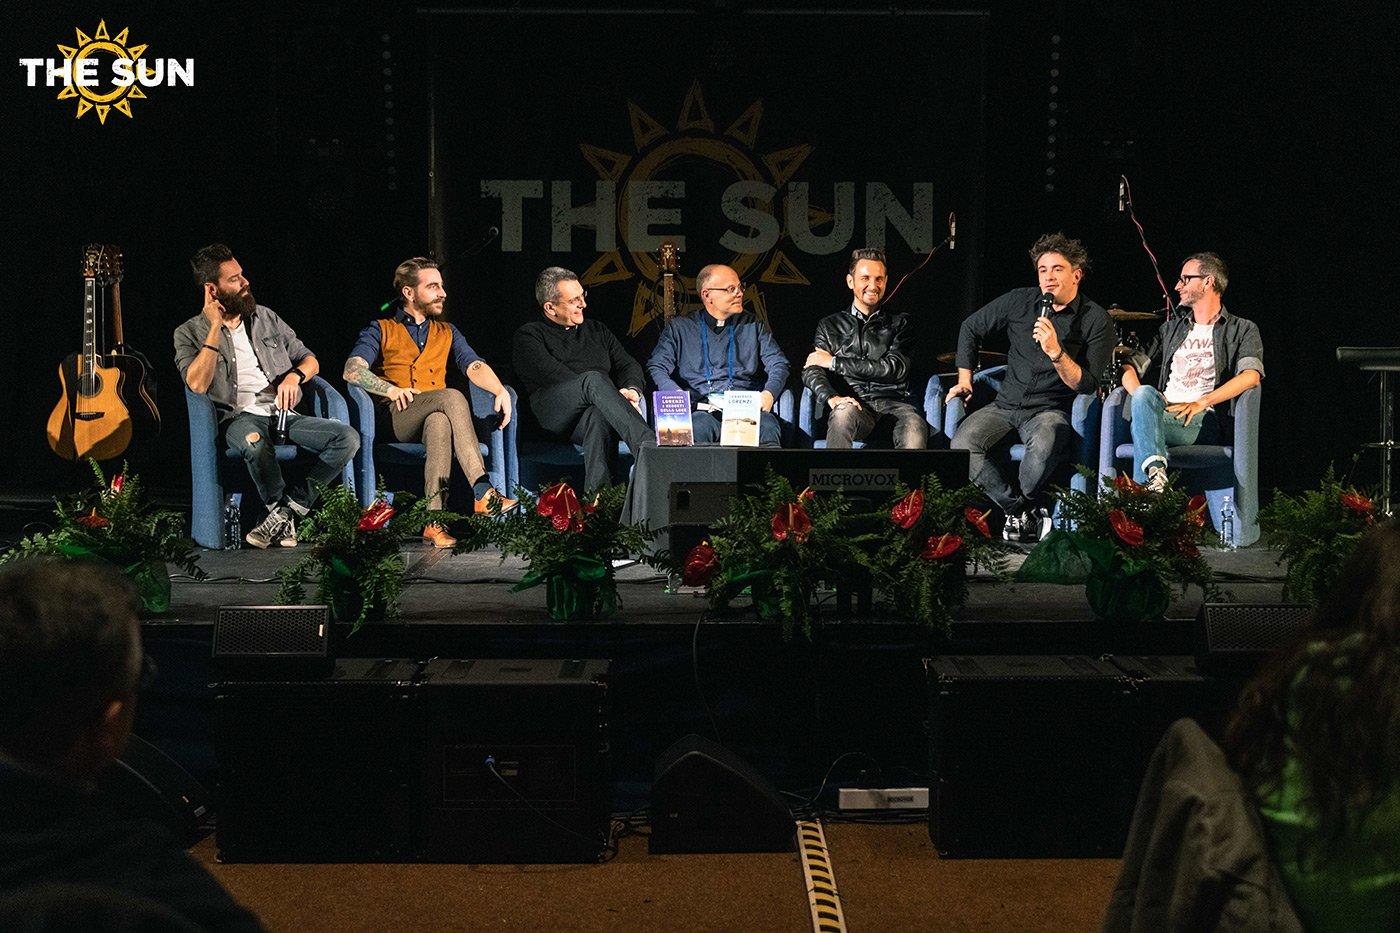 the sun rock band live roma cei